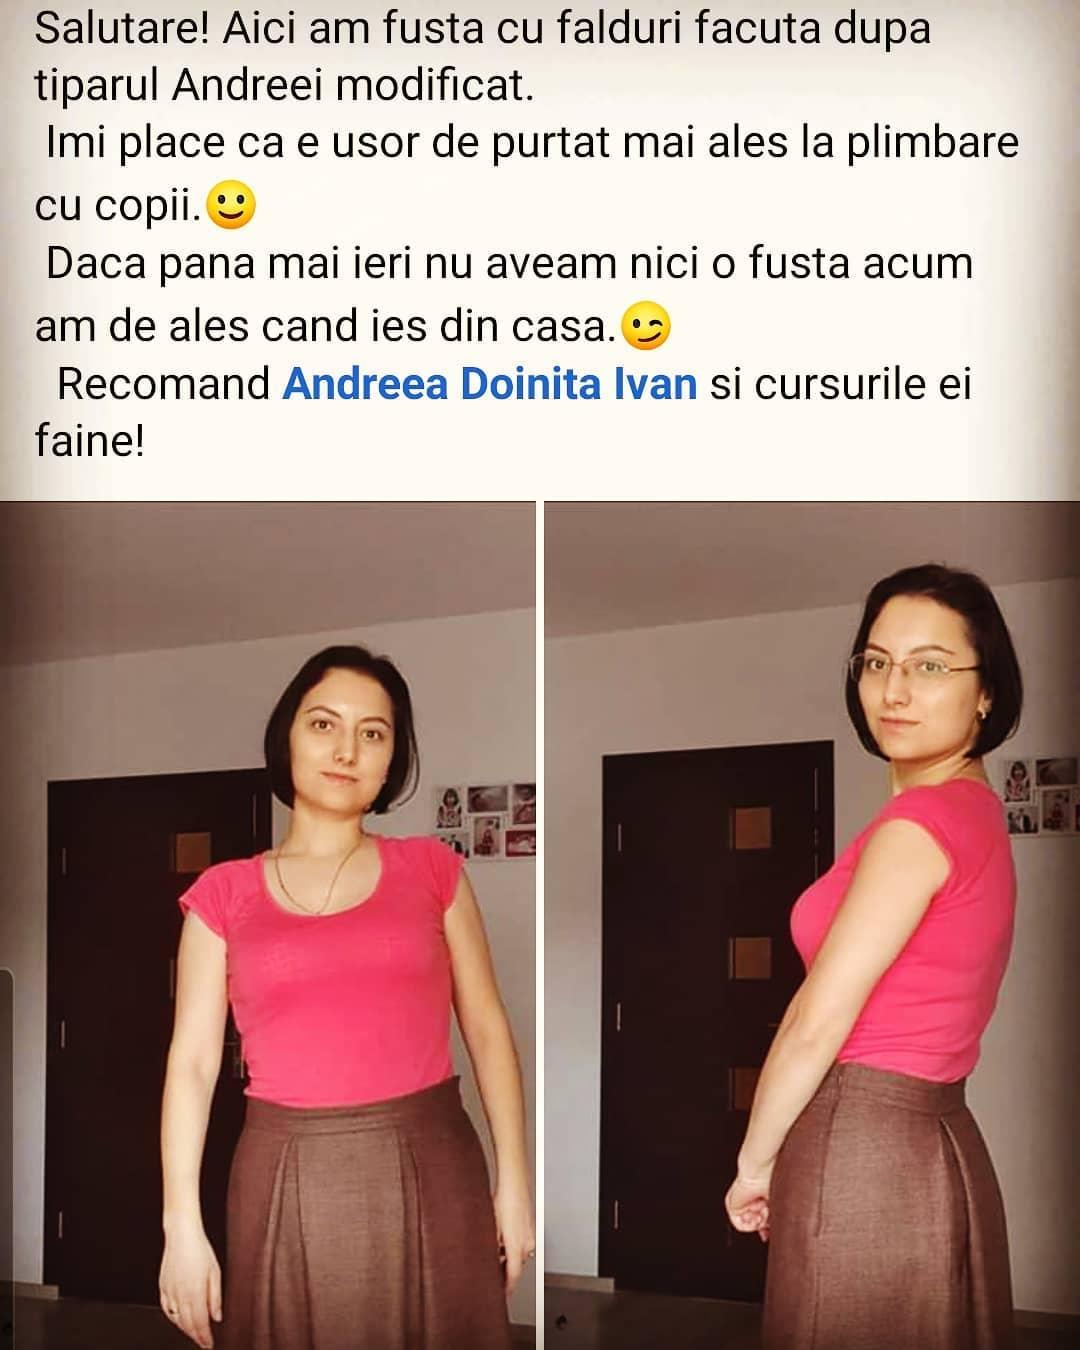 Curs online de tipare fusta _#summersewing #sew #fusta #fioreskirt #croitorie #pasiune #passion #sewing #pattern #fashion #fashionista #romania #feminitate